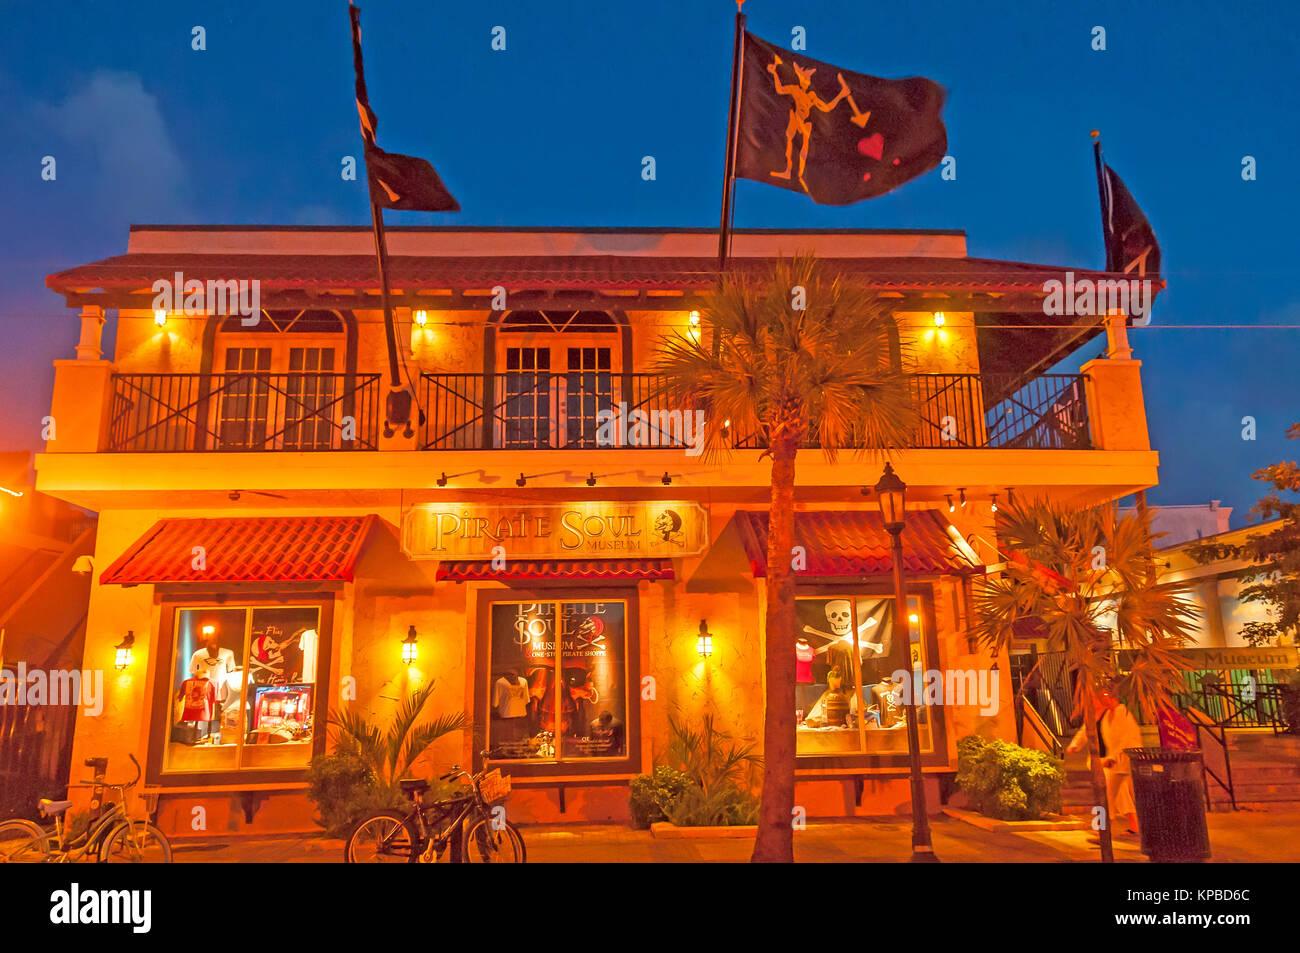 Pirate Soul Museum exterior at night, Key West, florida - Stock Image